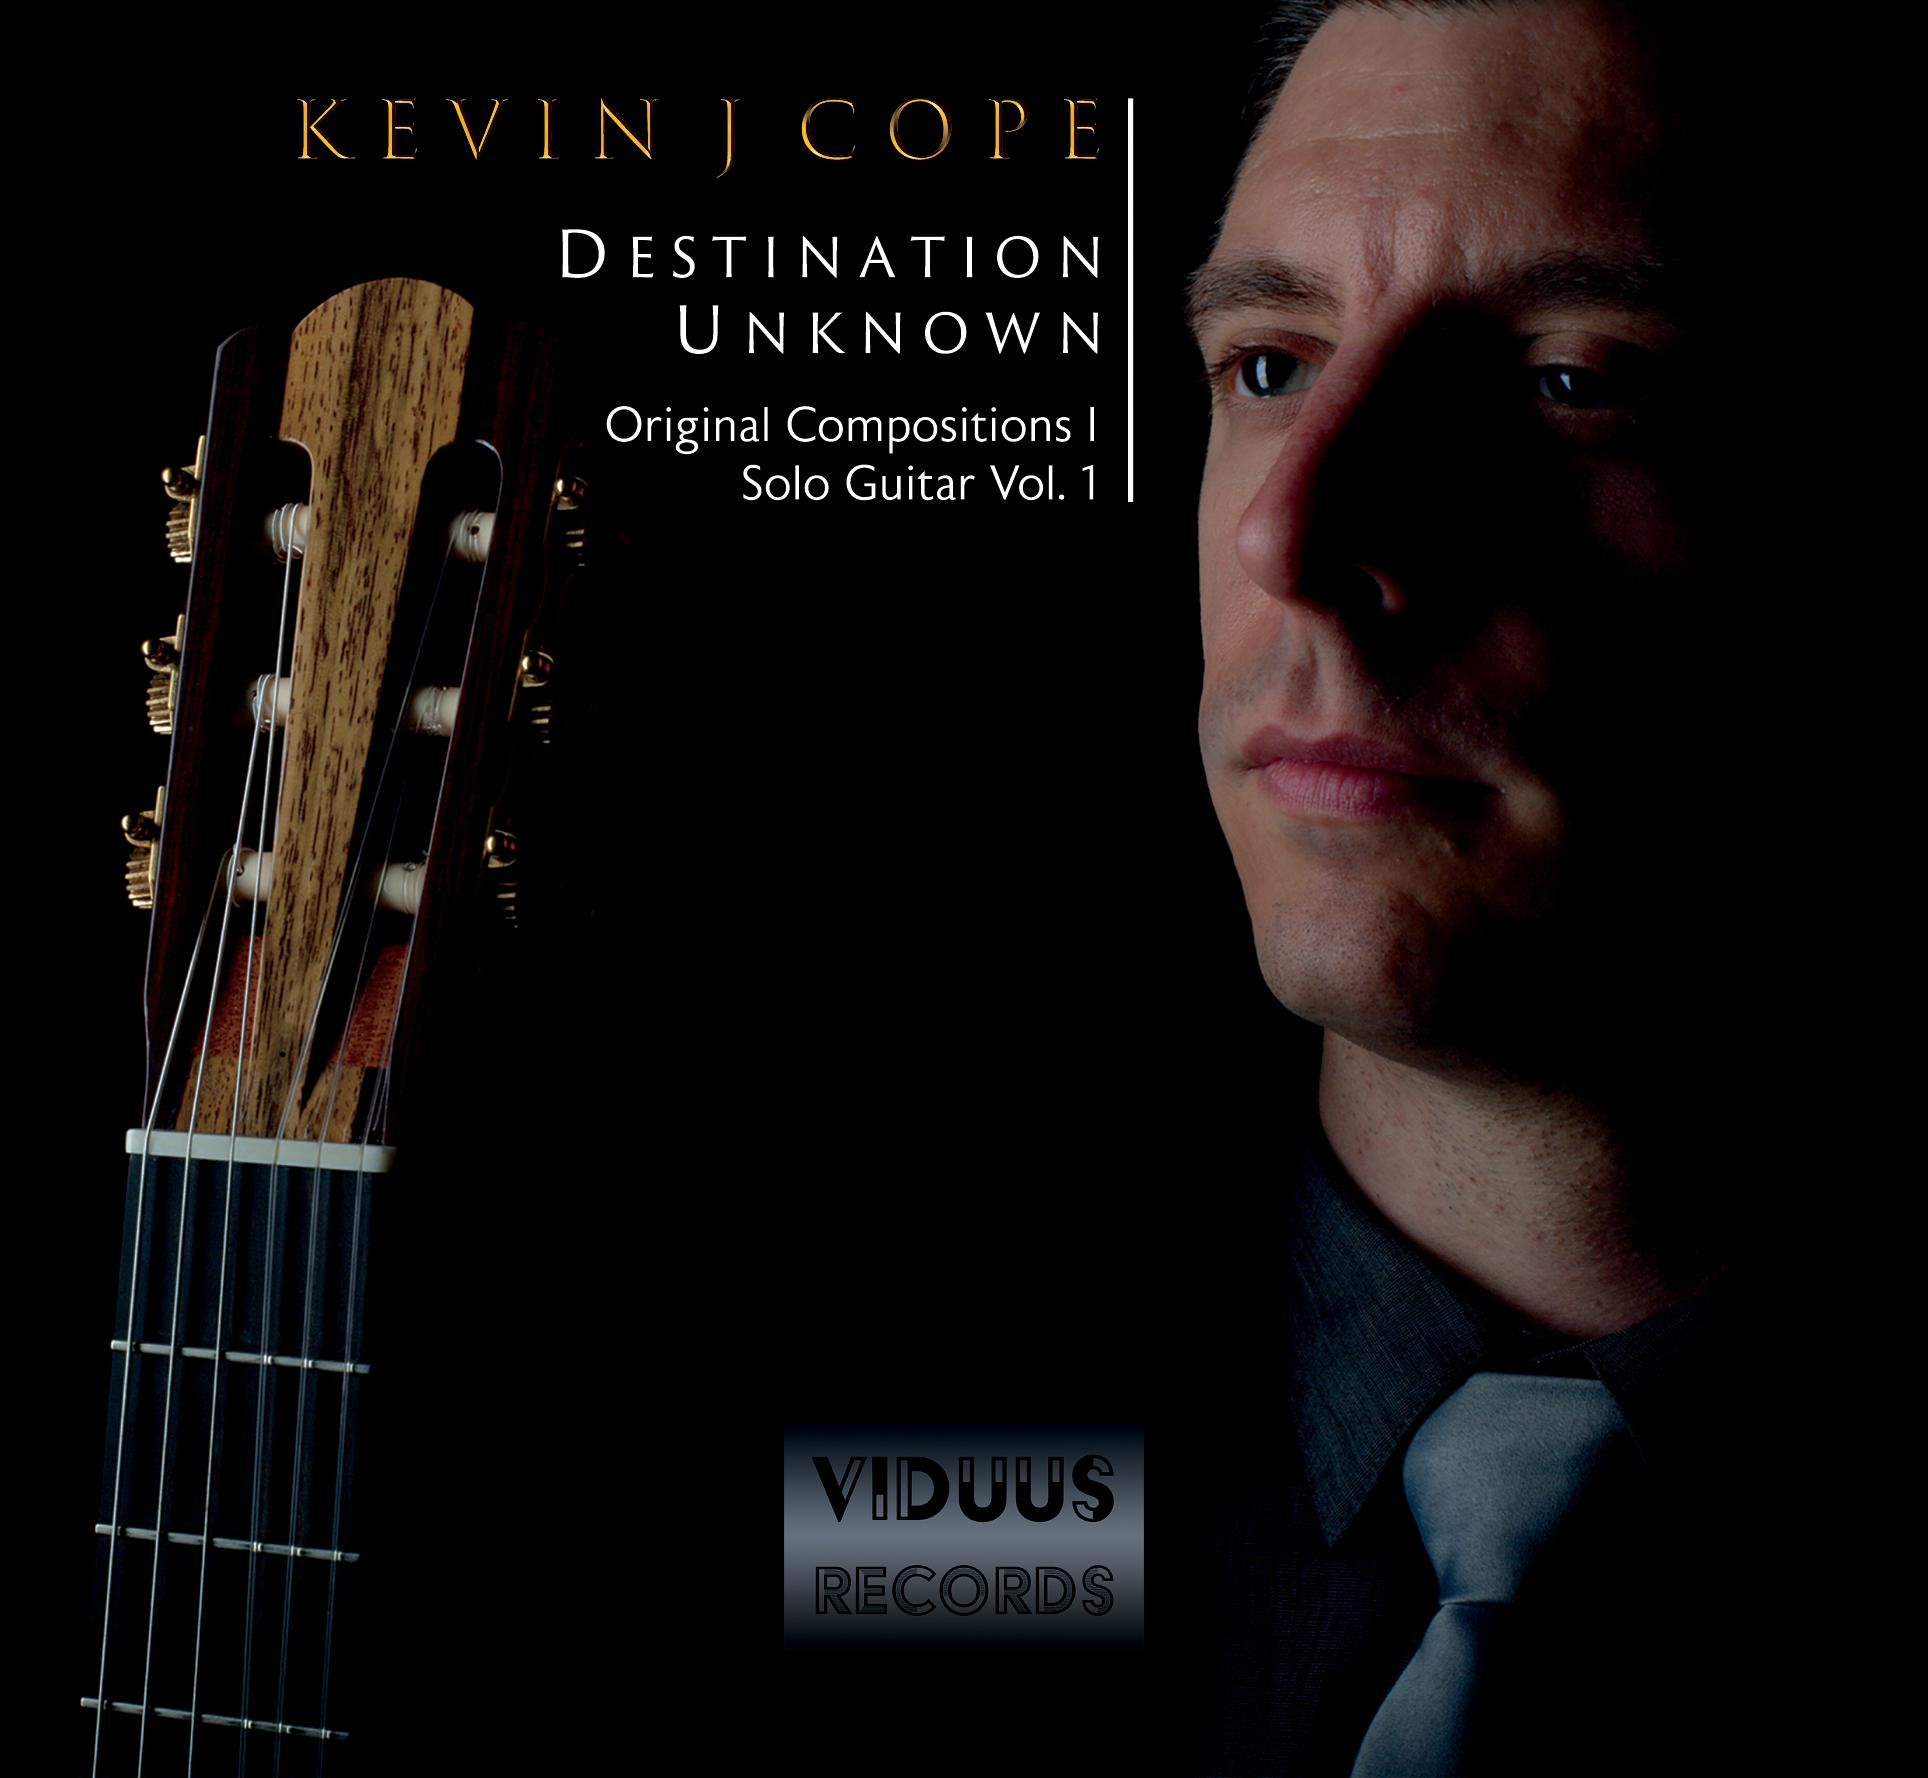 Kevin-J-Cope-Destination-Unknown-CD.jpg